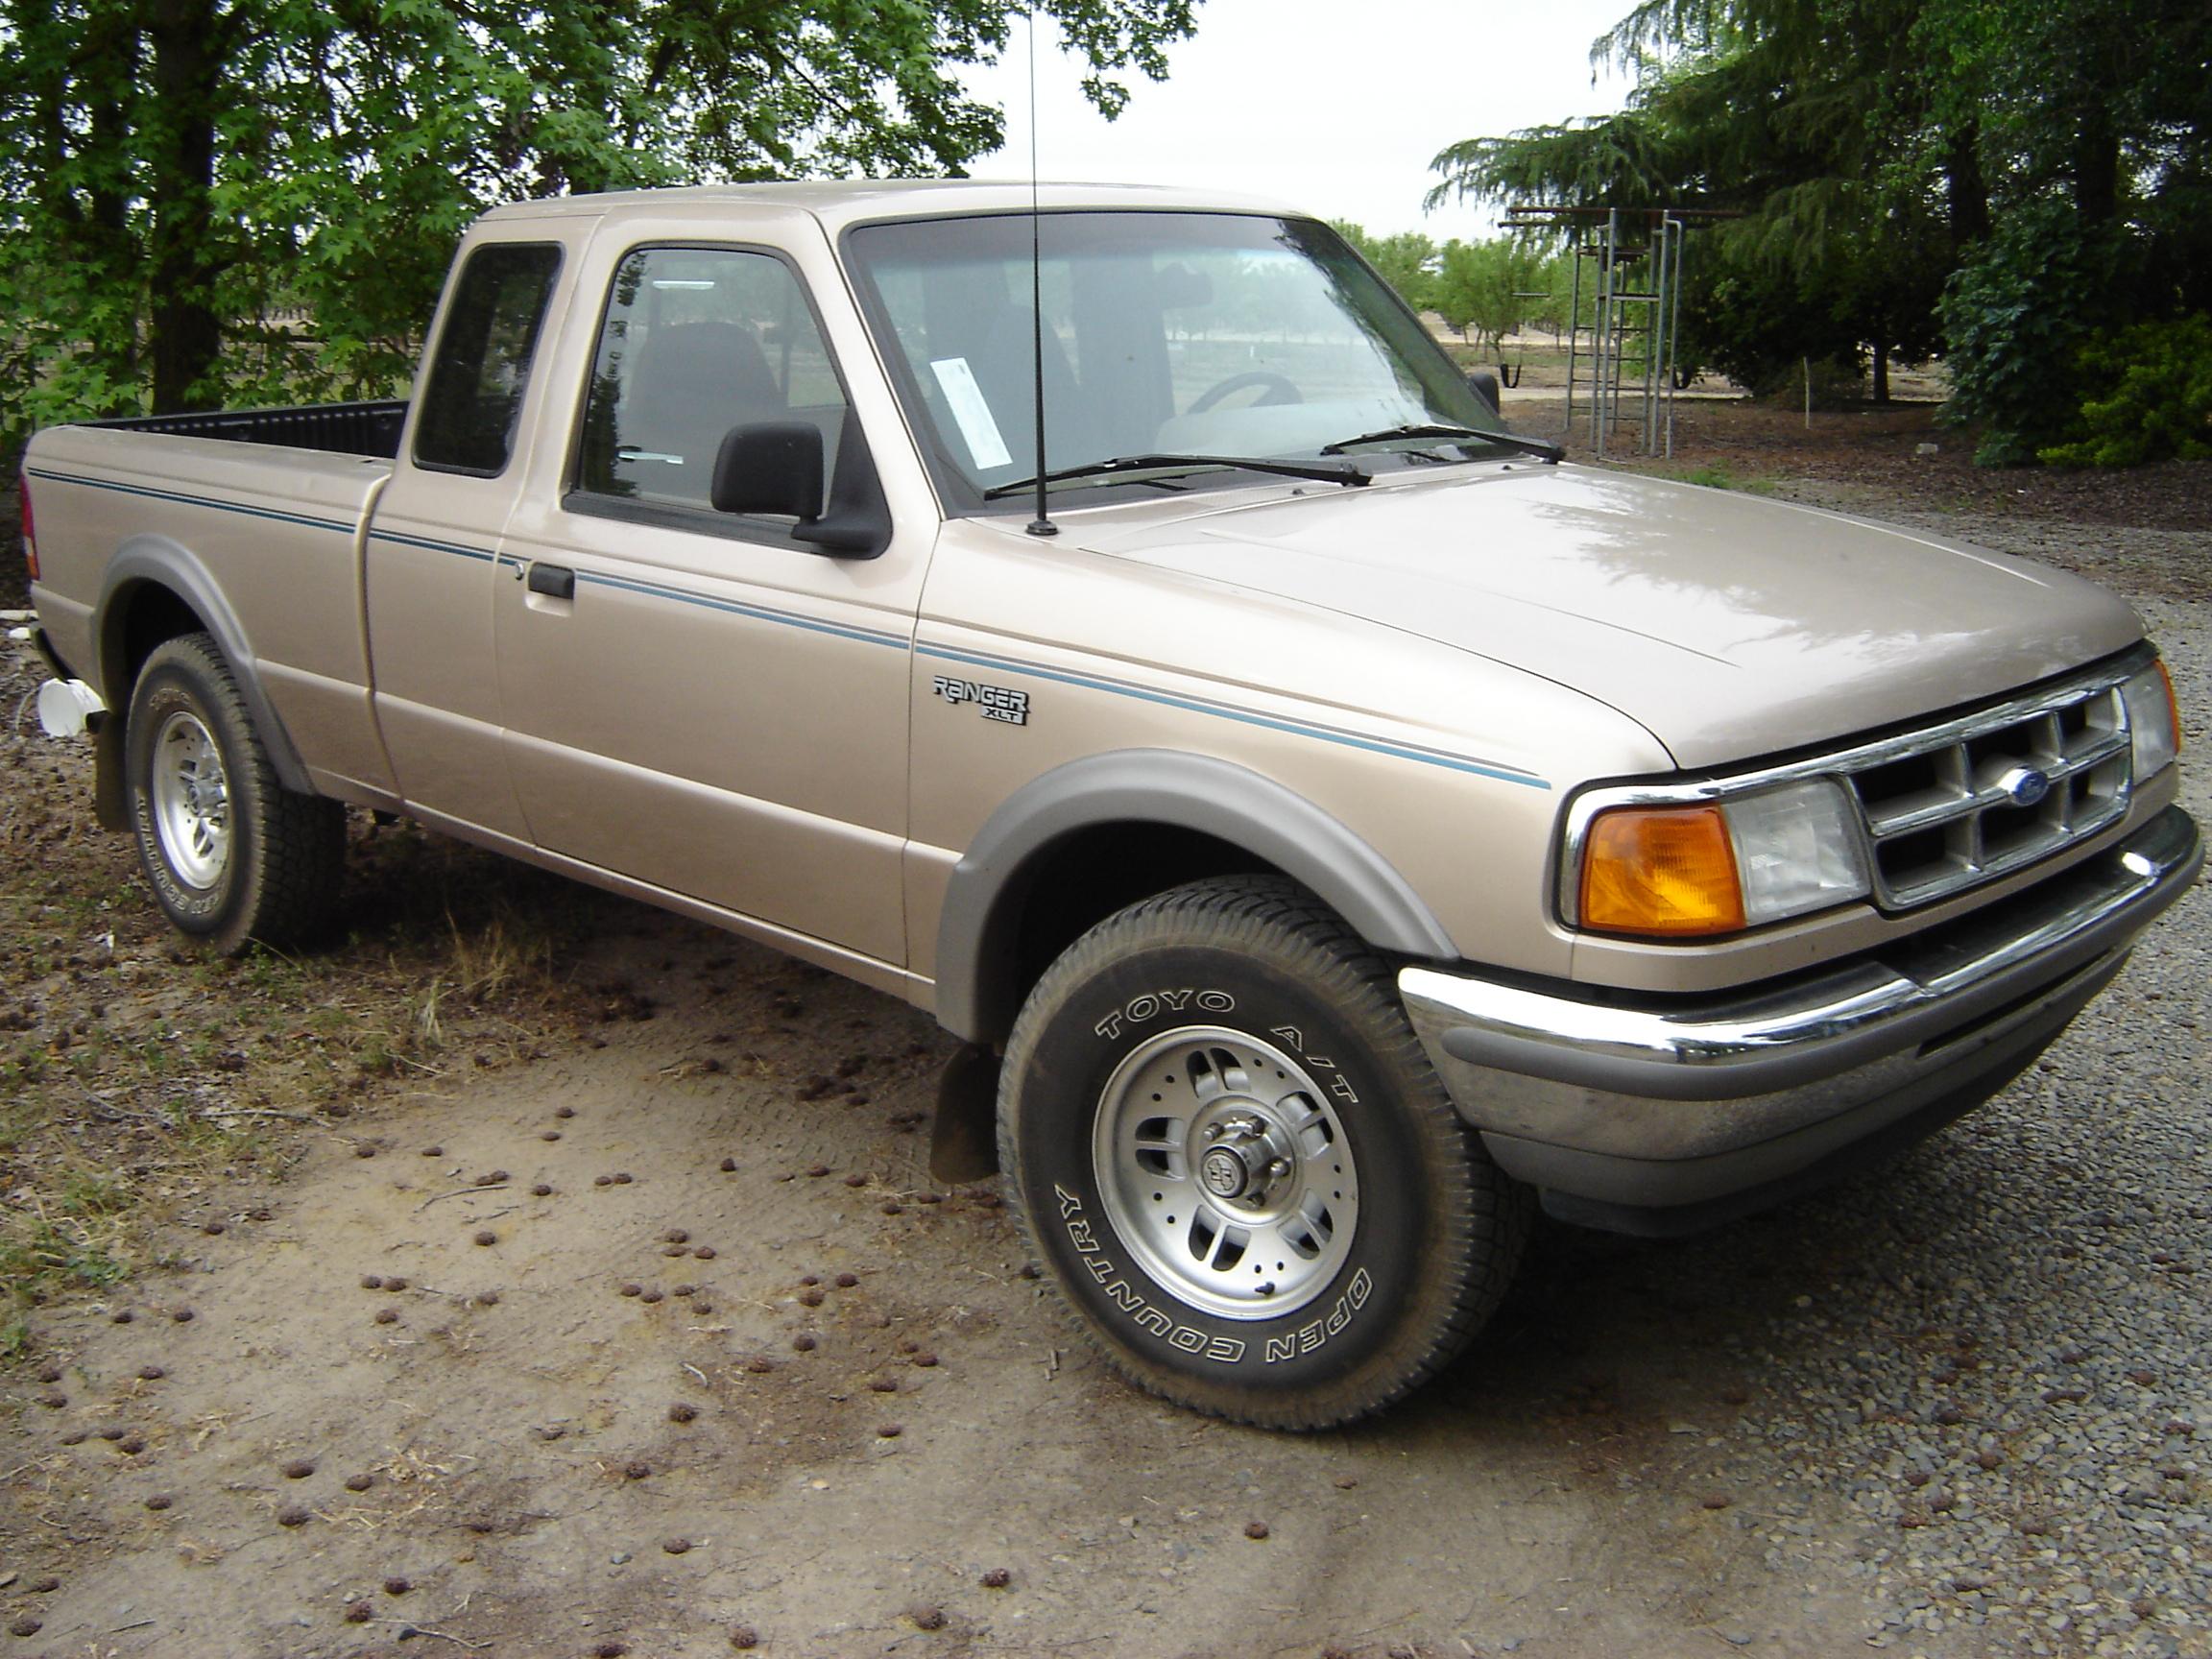 Ford Ranger (North America) I 1983 - 1988 Pickup #1